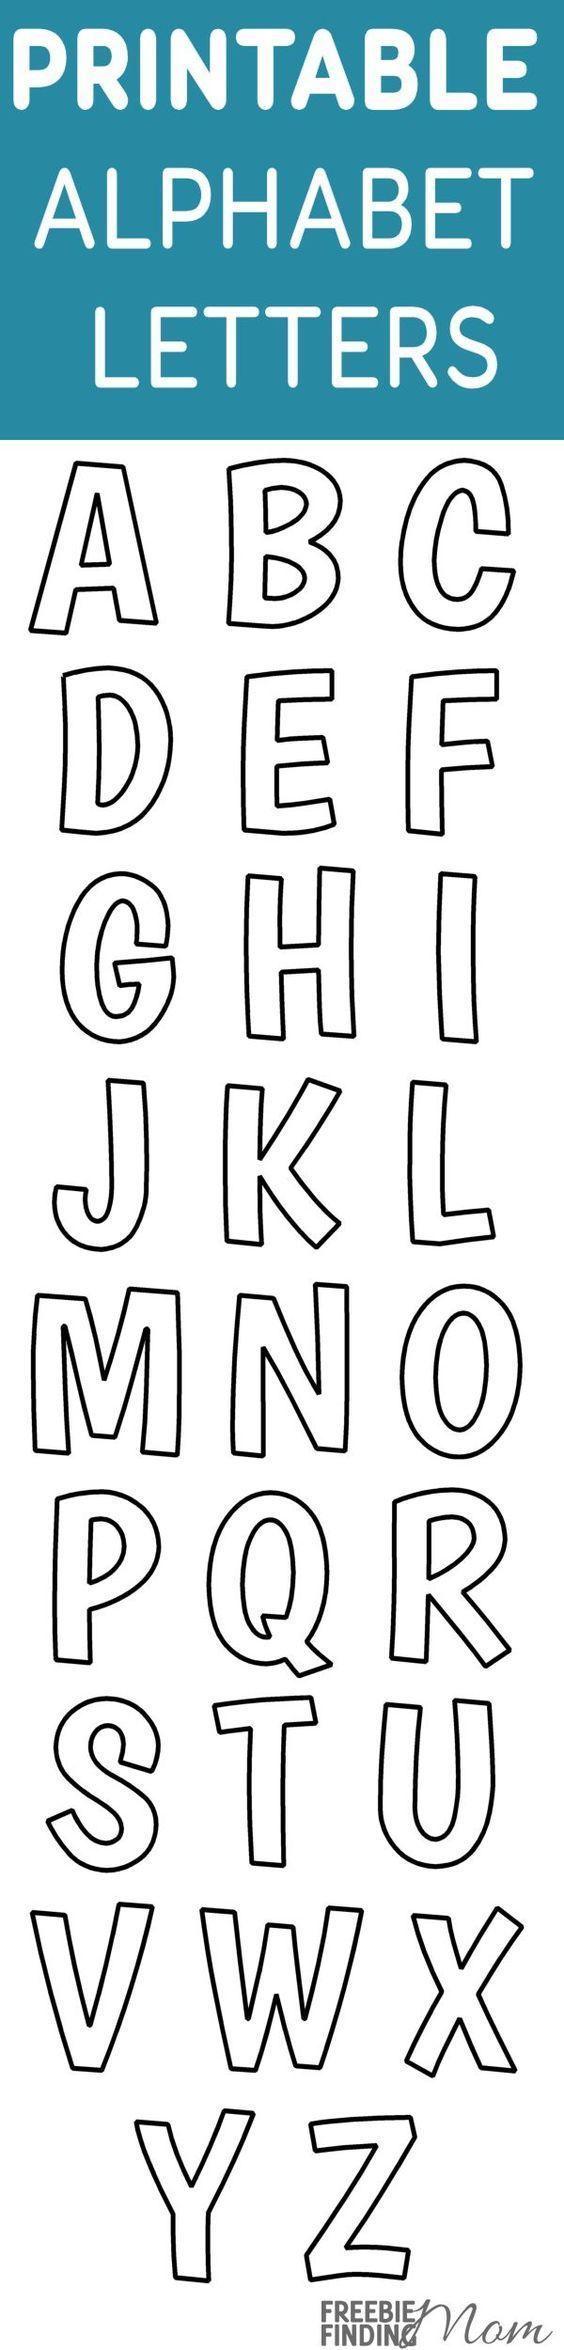 Letter Stencils To Print Printable Letter Templates Stencils Printables